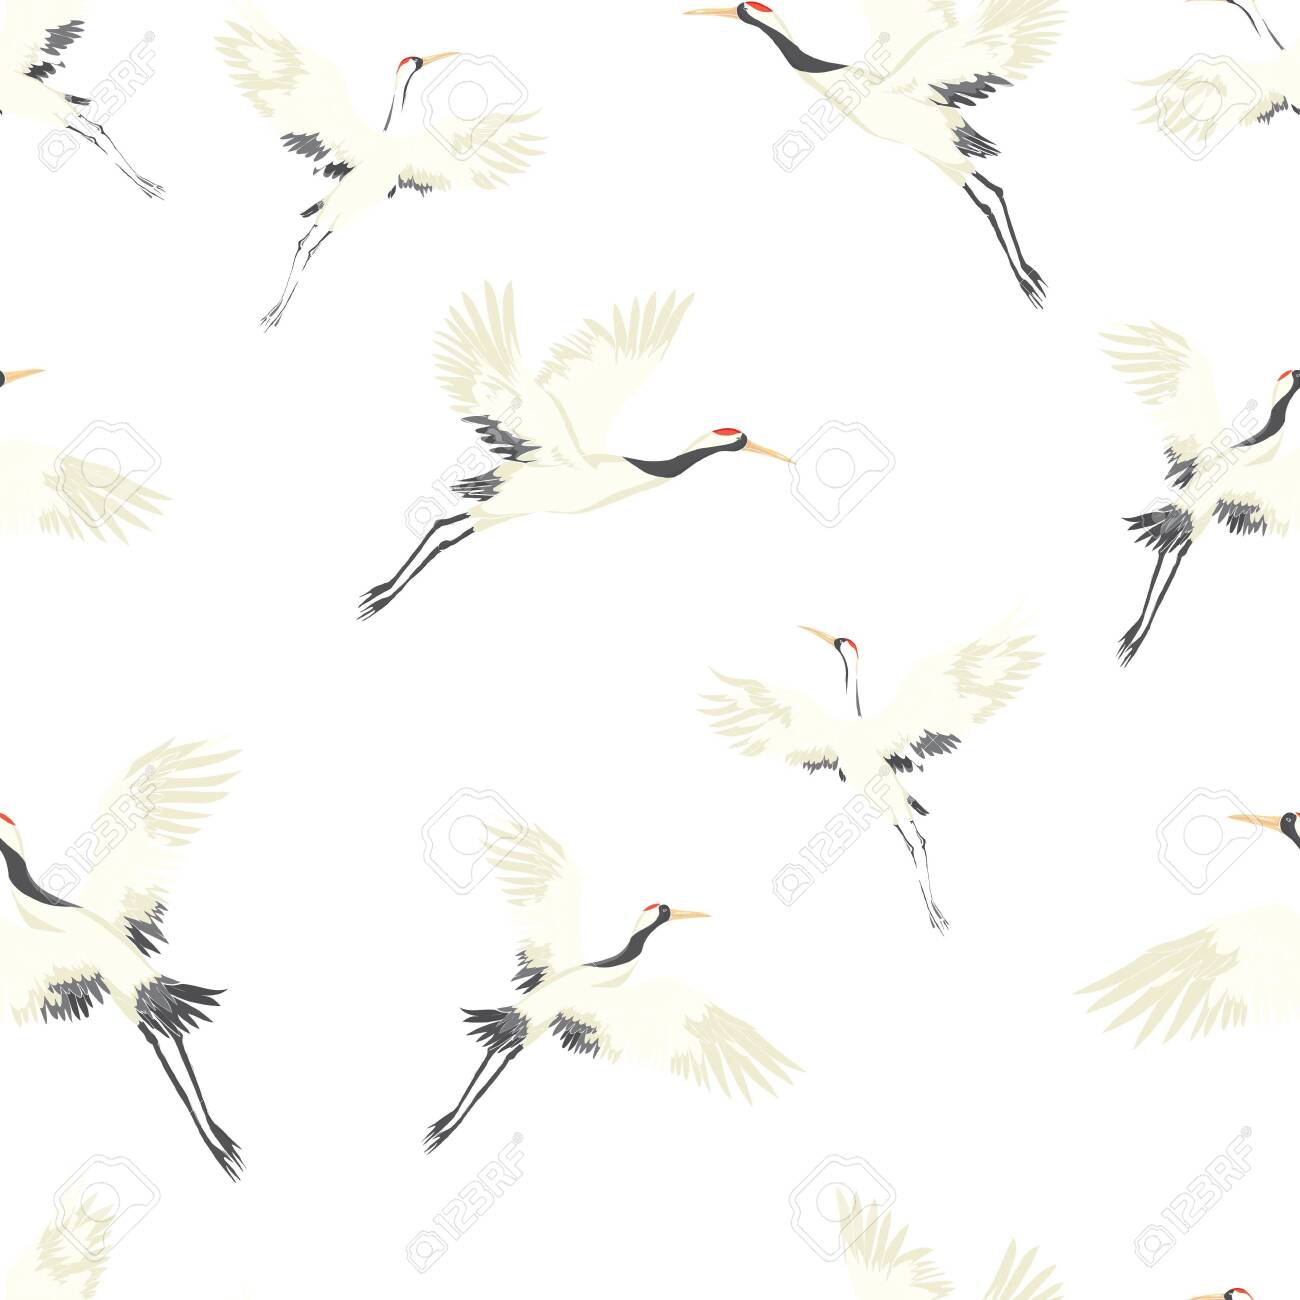 Seamless background, with Oriental motifs, cranes are flying, pattern vector illustration bird flower. Vector illustration. - 141013146